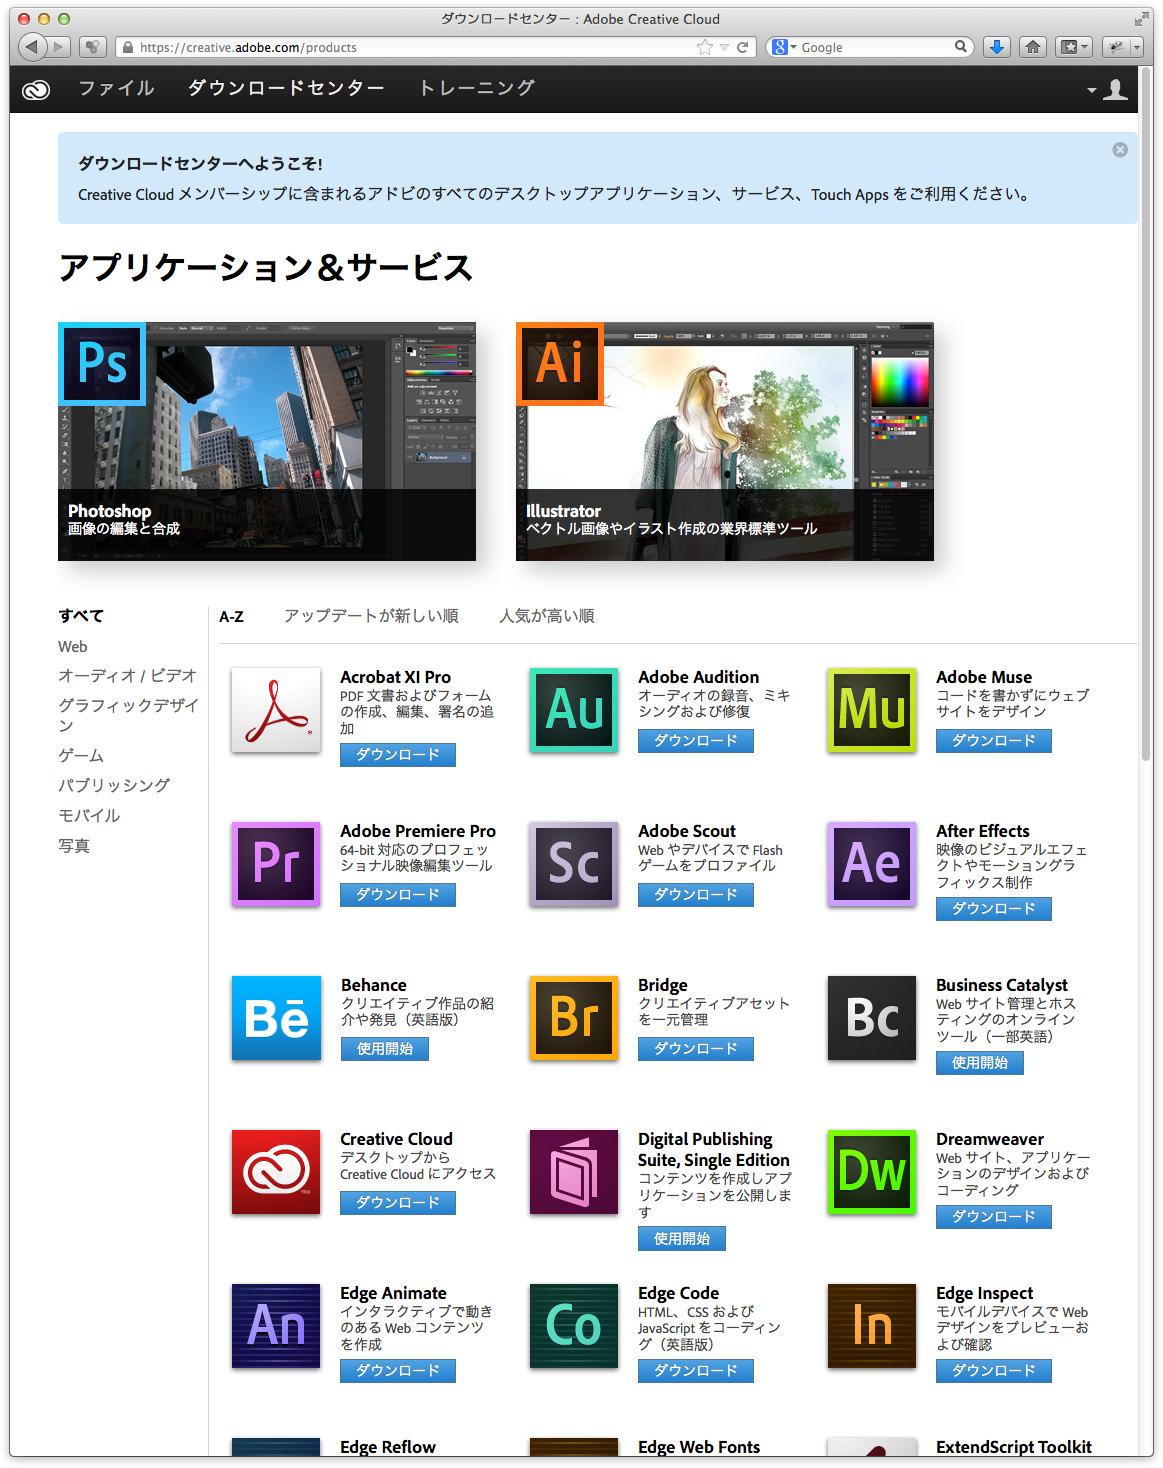 cc-downloadcenter-s.jpg